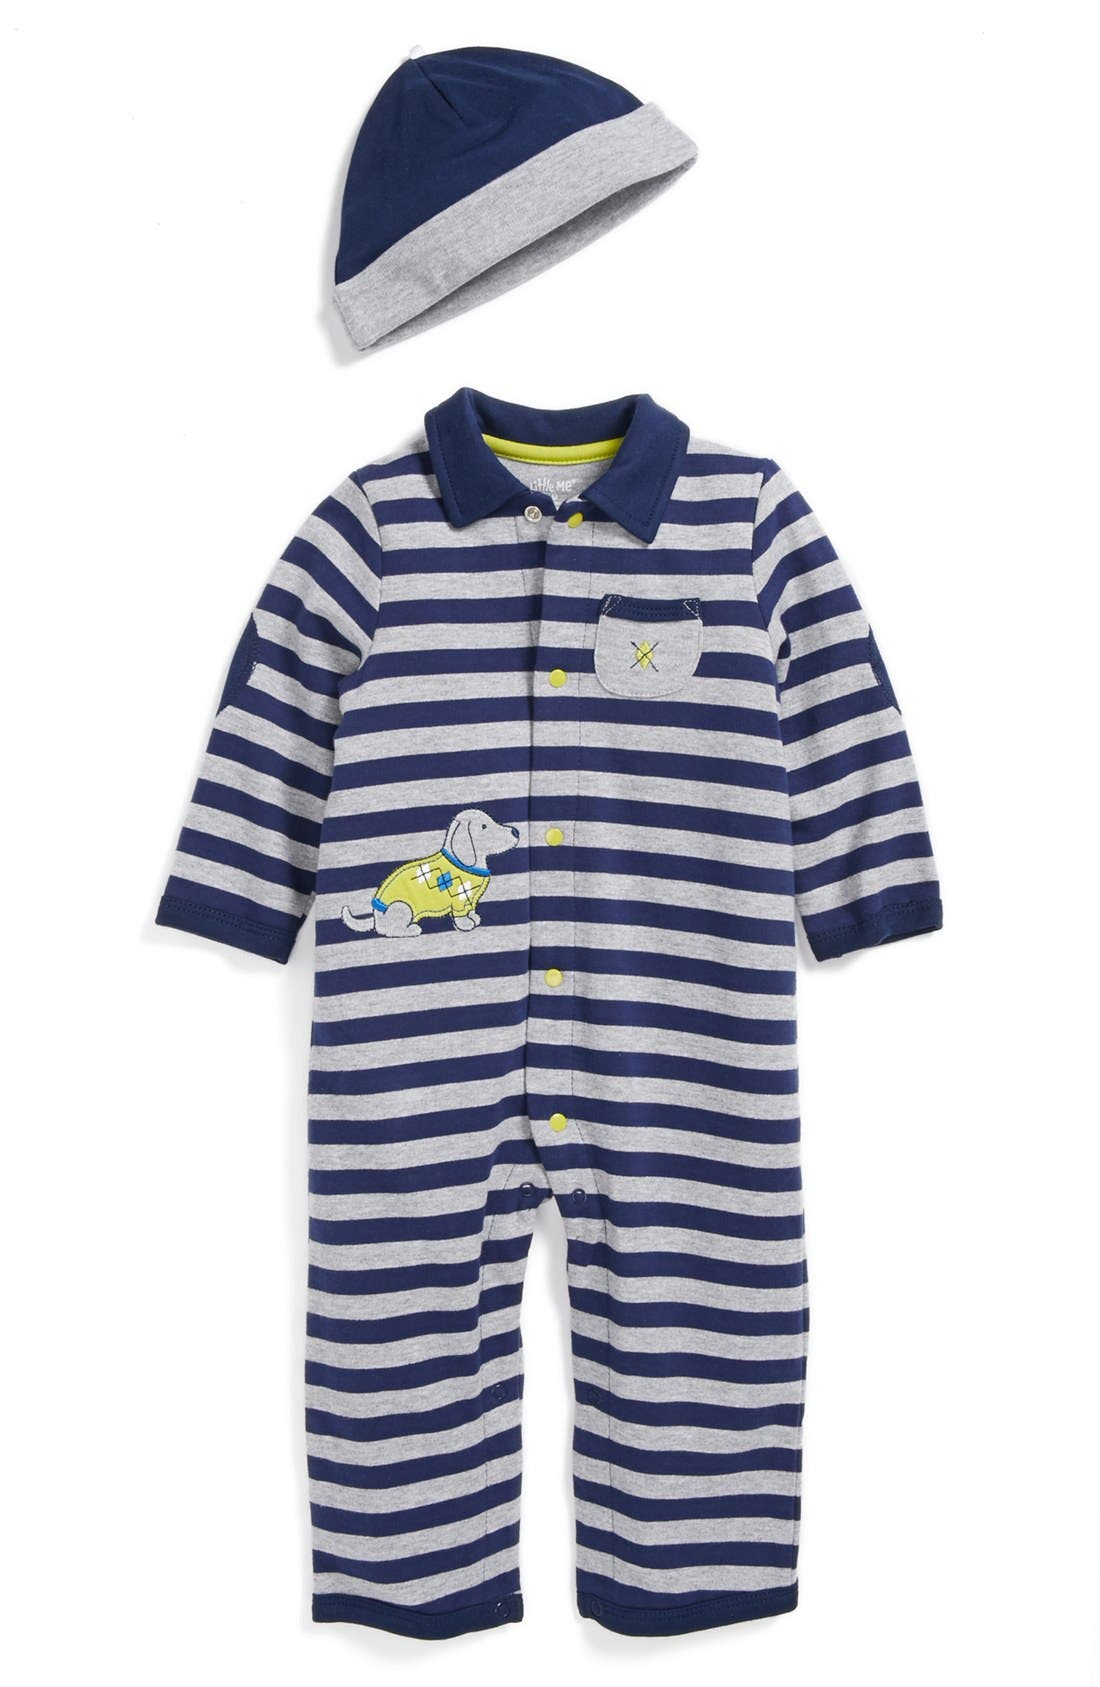 Main Image - Little Me Dachsund Romper & Hat (Baby Boys)